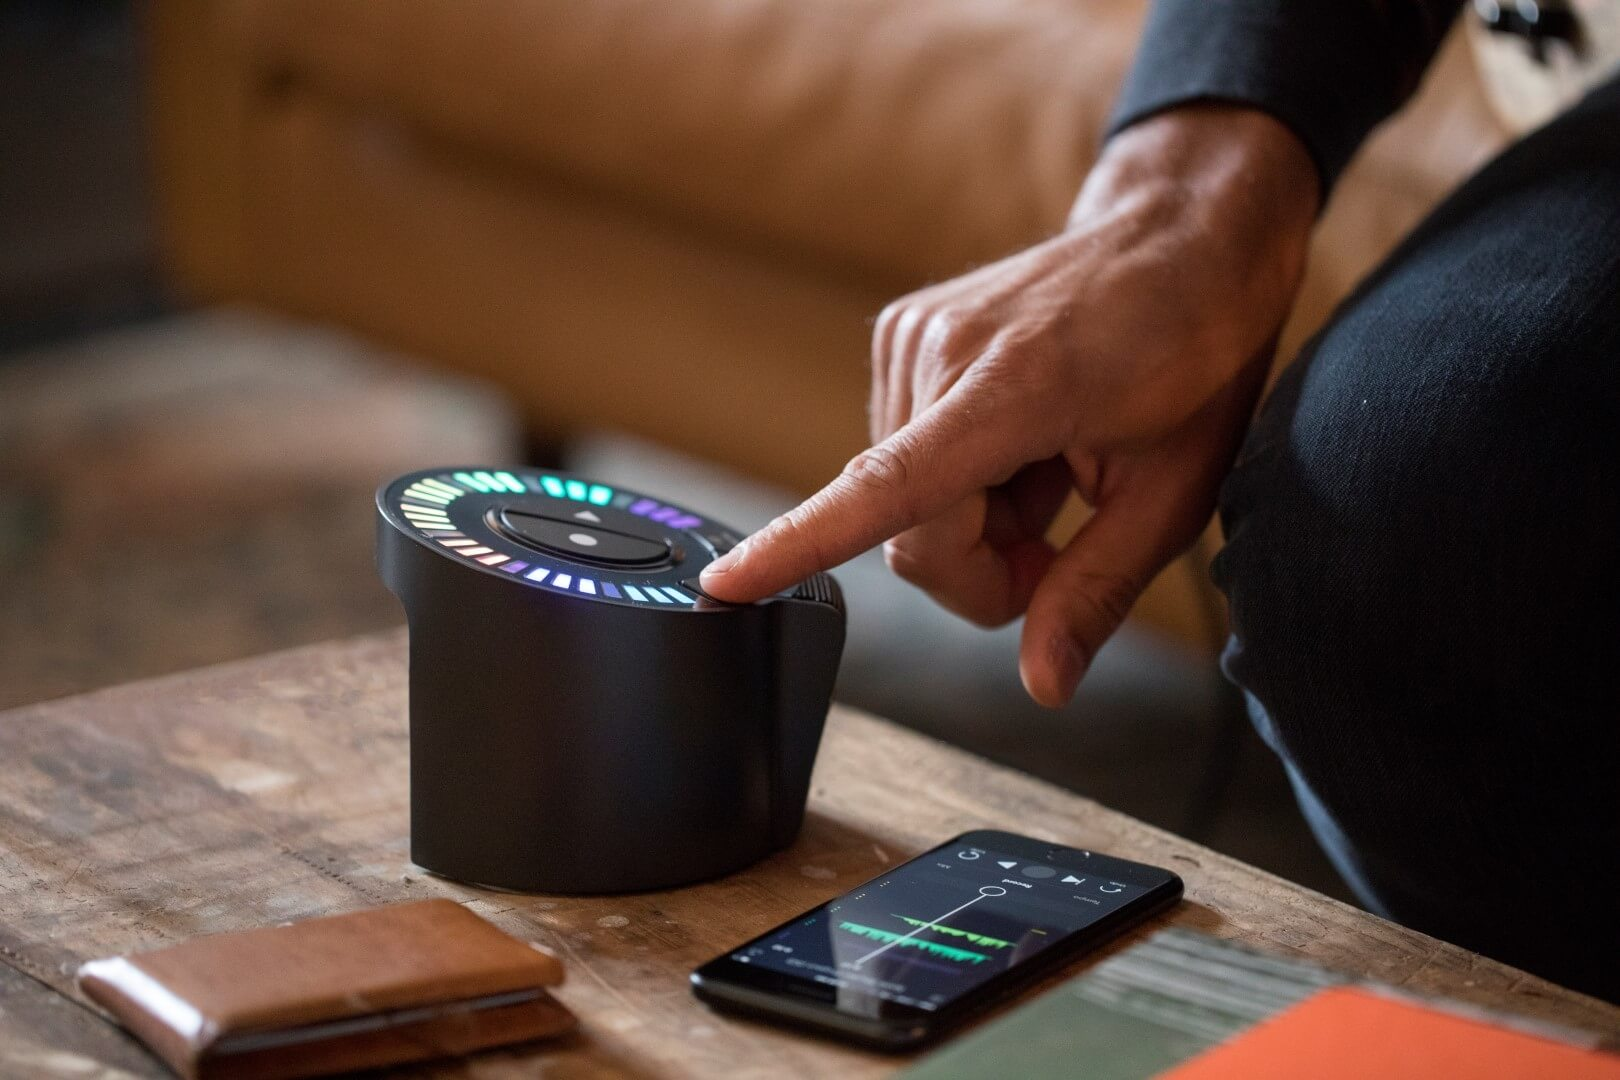 iZotope Spire Studio portable recording studio gets Android support